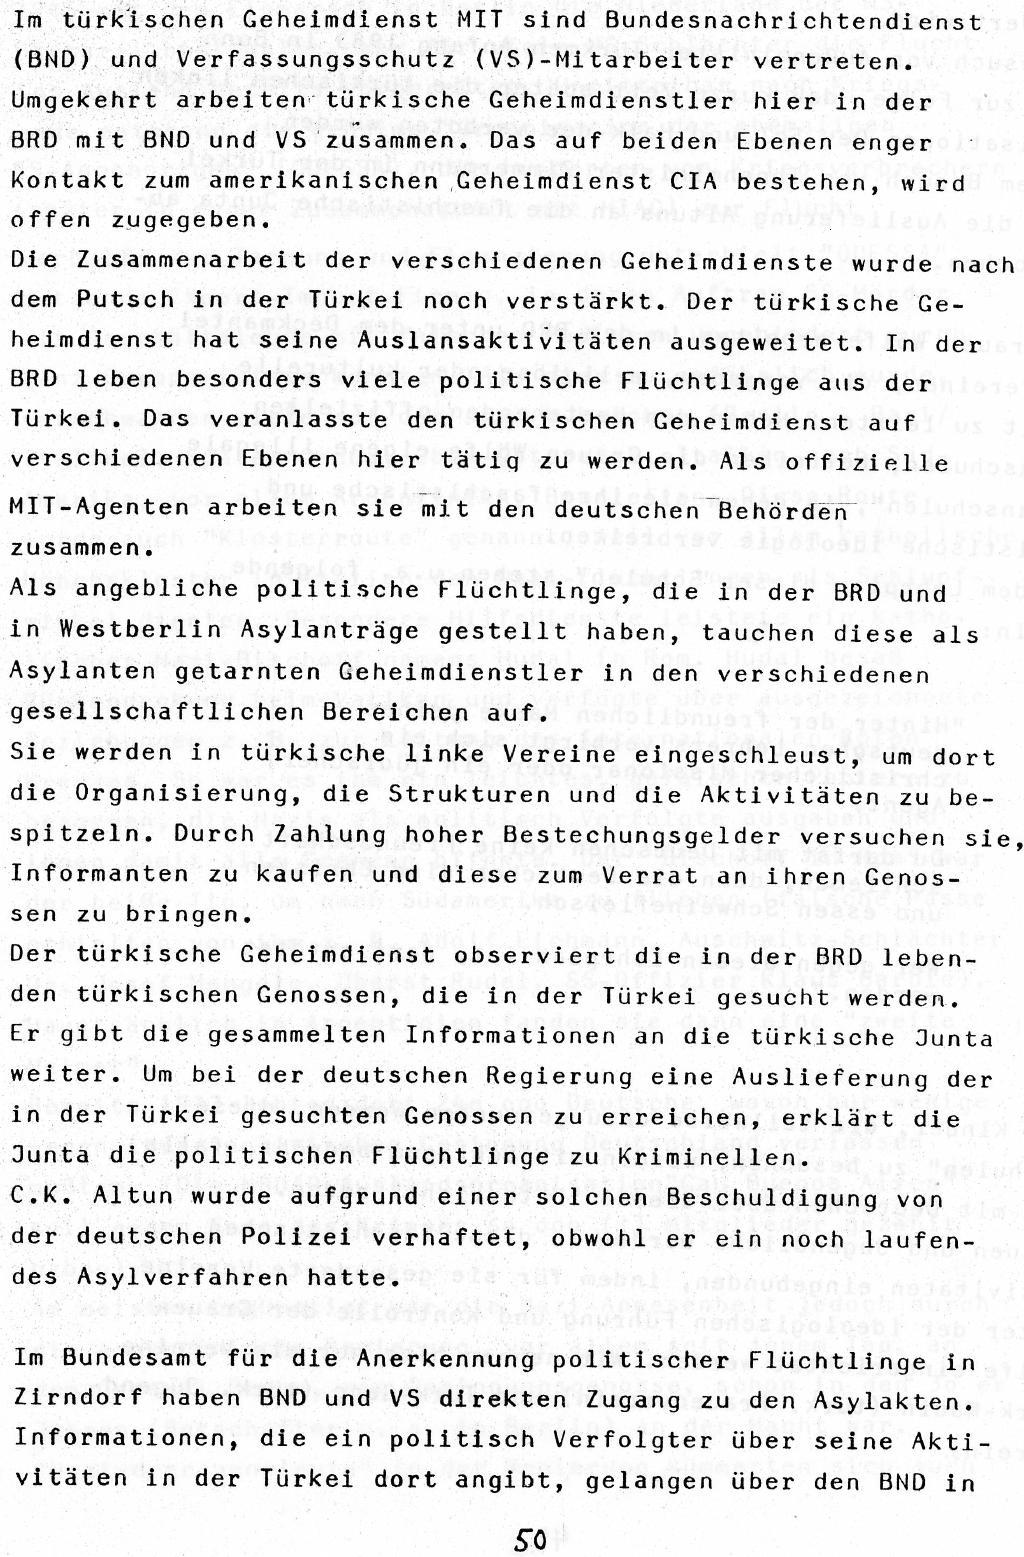 Berlin_1983_Autonome_Gruppen_Faschismus_im_Kapitalismus_50